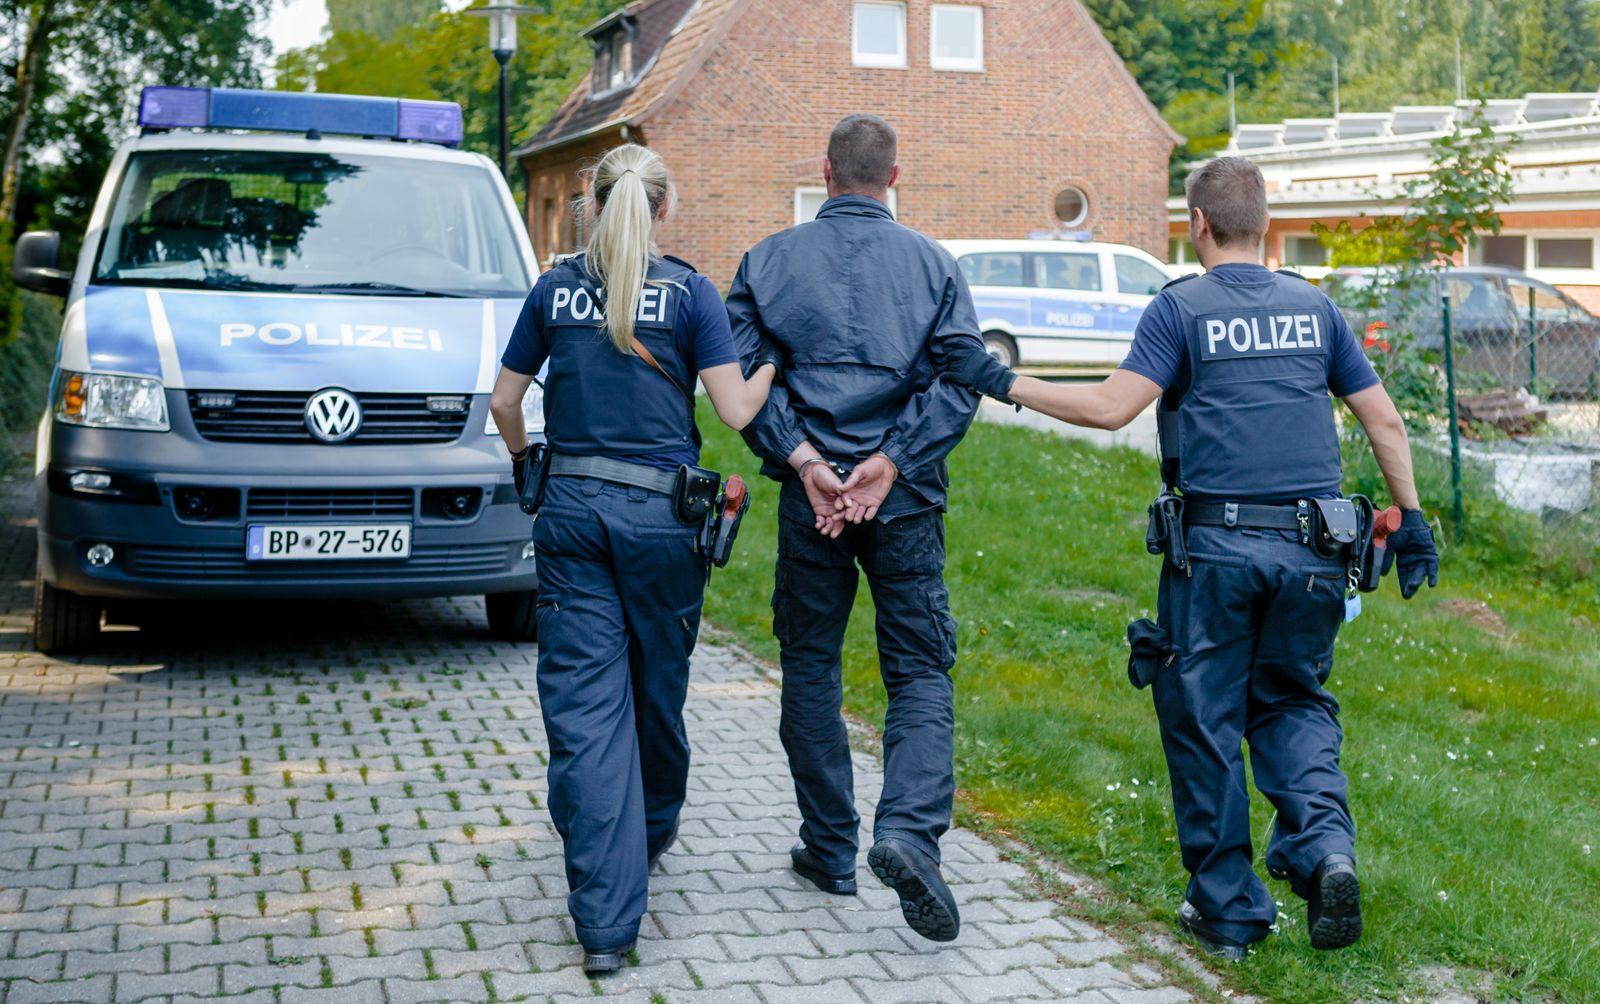 Bundespolizeiakademie in Lübeck